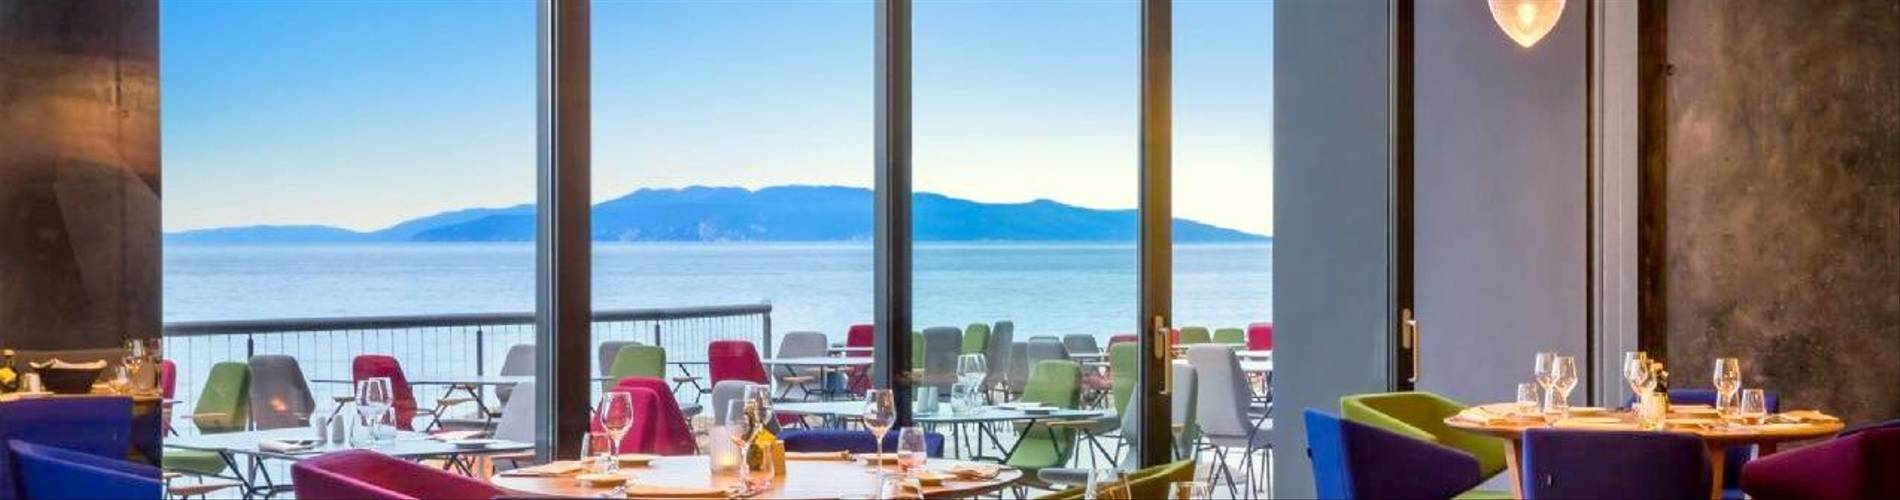 Hotel-restaurant-Hotel-Navis-Opatija-lit.jpg